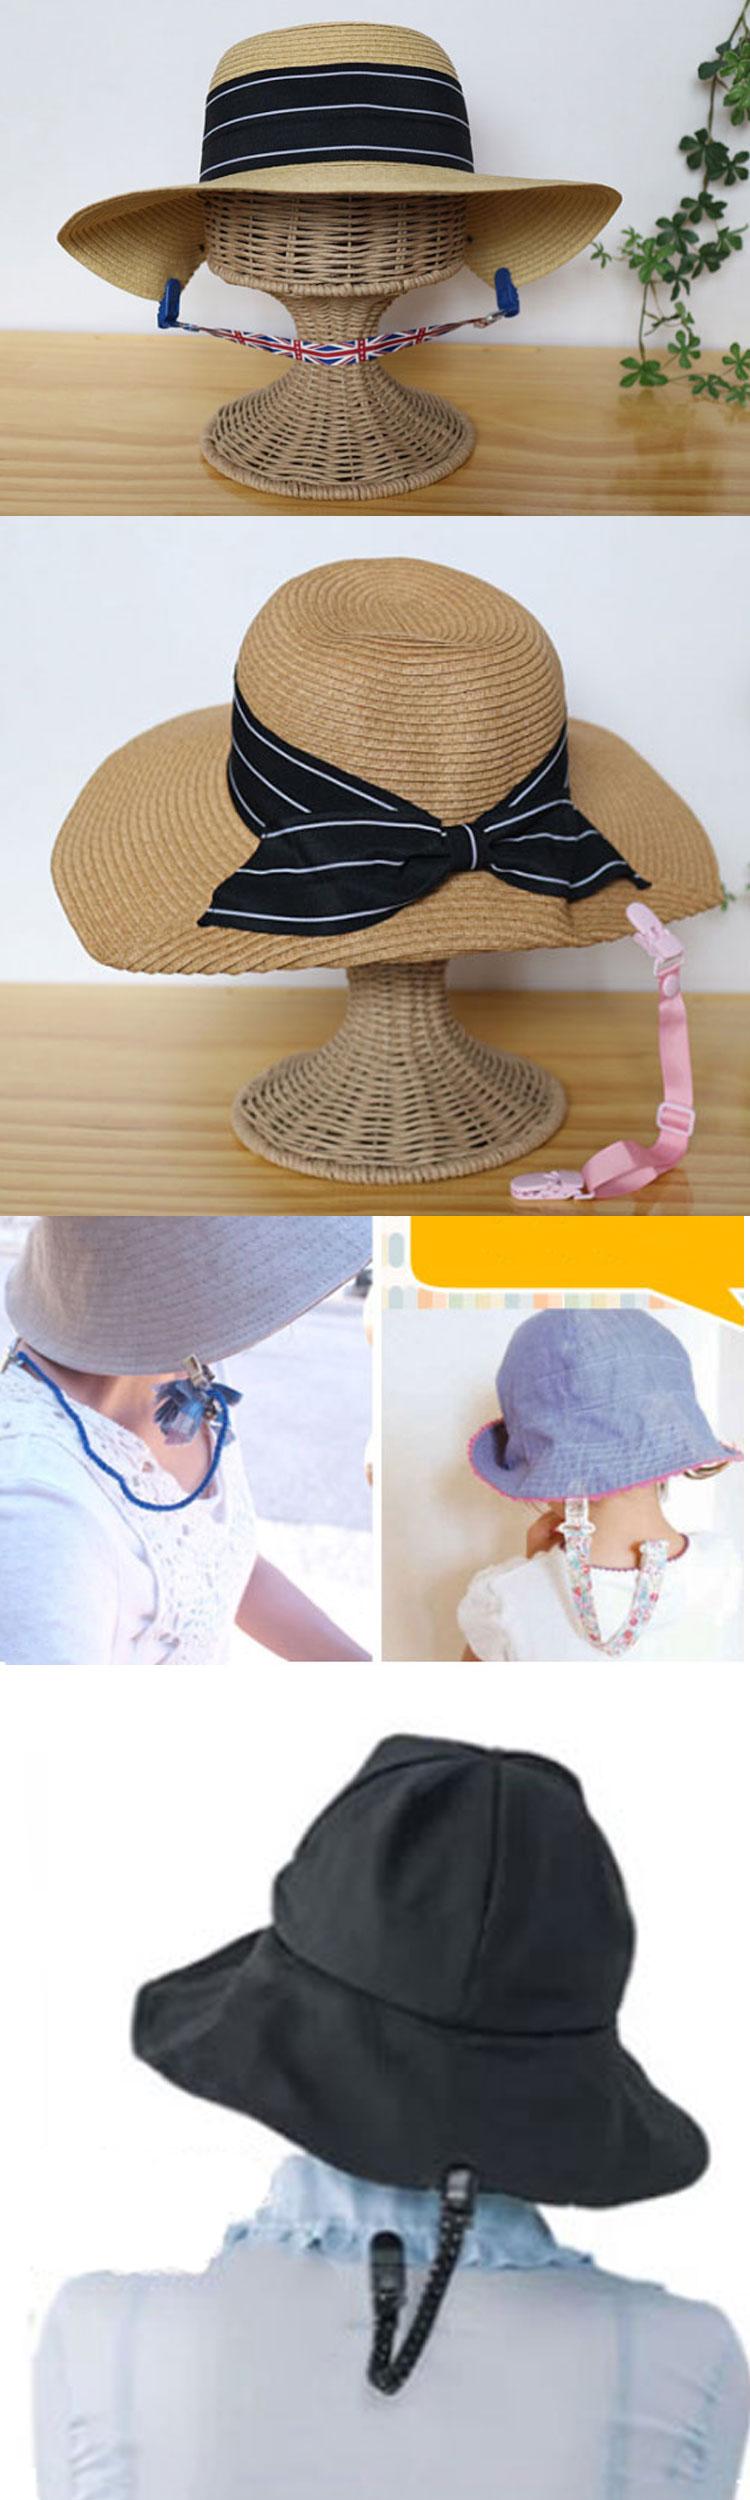 Anti-lost windproof plastic adjustable clip hat holder cap retainer for kids